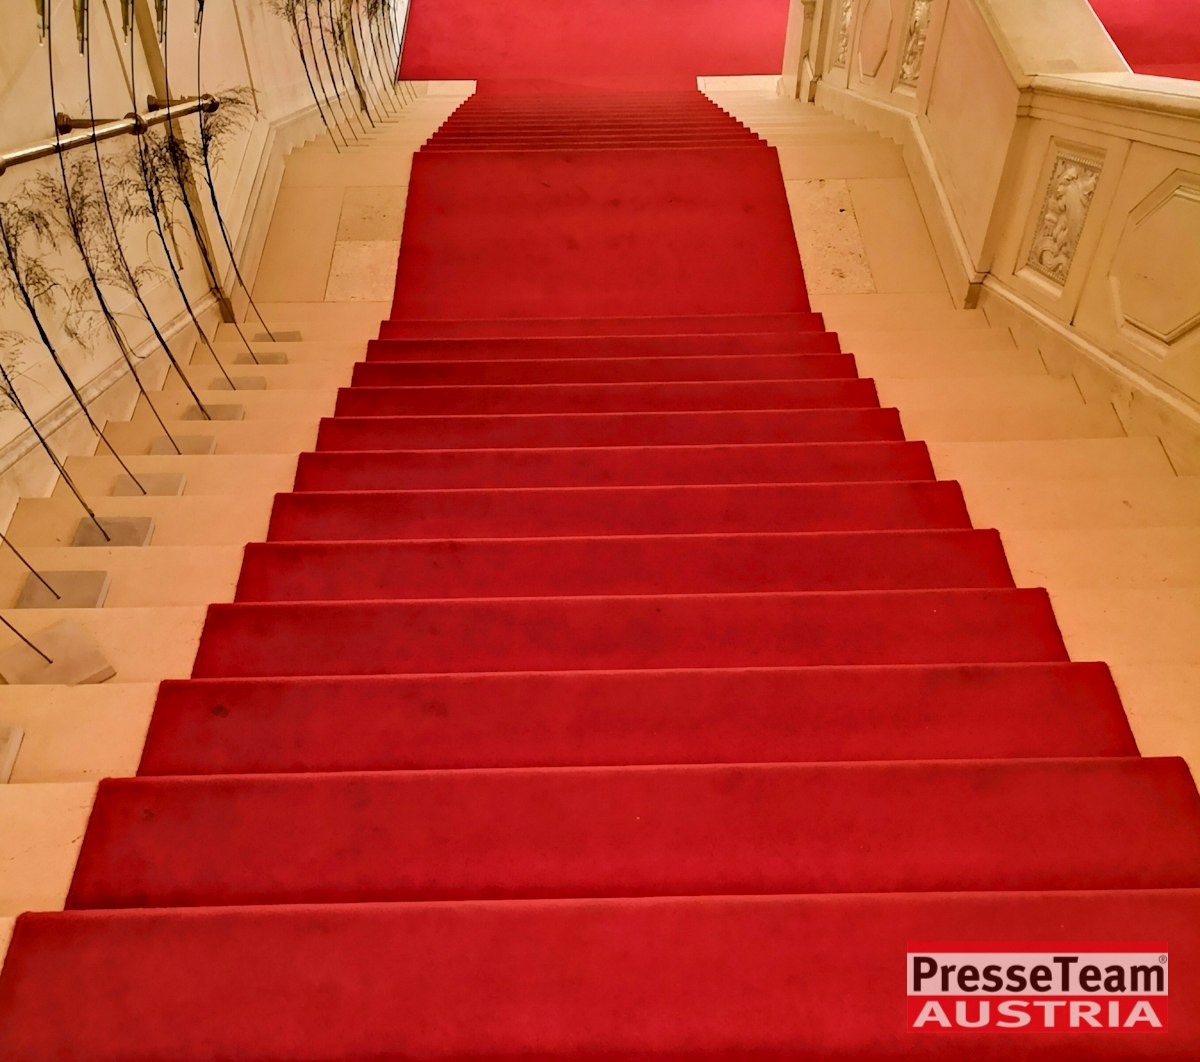 Messe Hofburg Wien 14 - Luxus Möbelmesse & Lifestyle in der Hofburg Wien